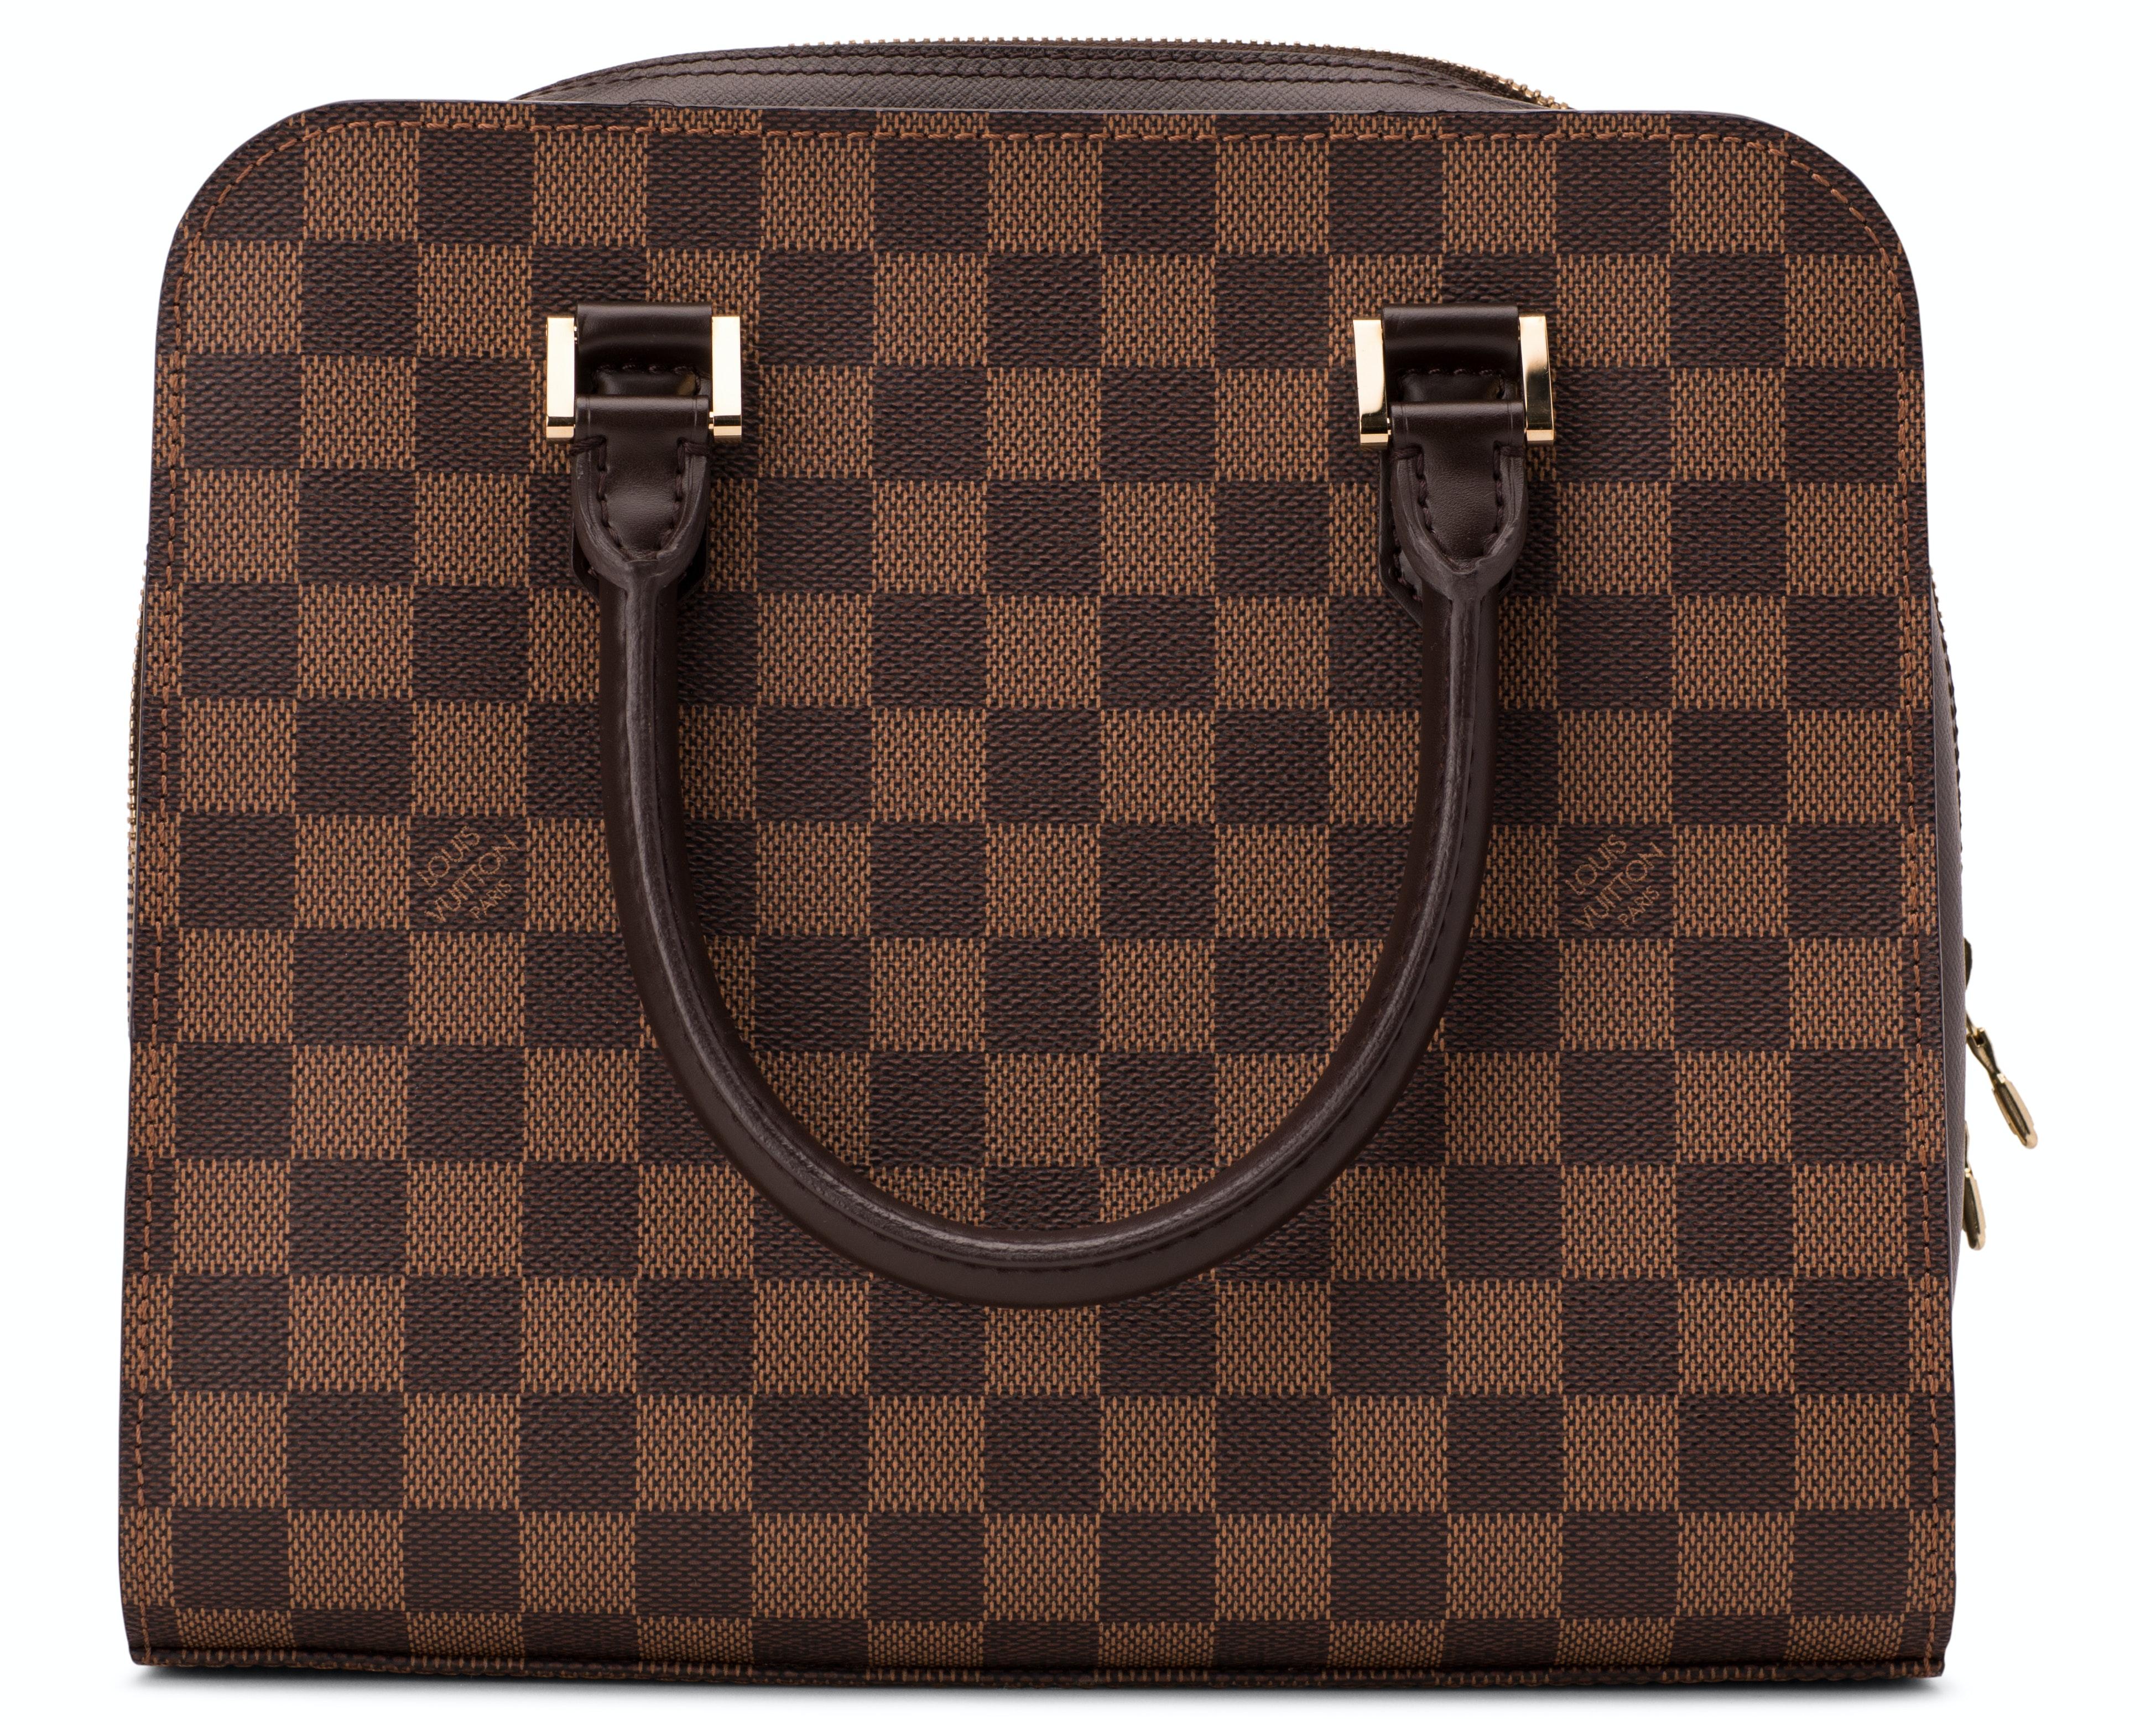 Louis Vuitton Triana Damier Ebene Brown